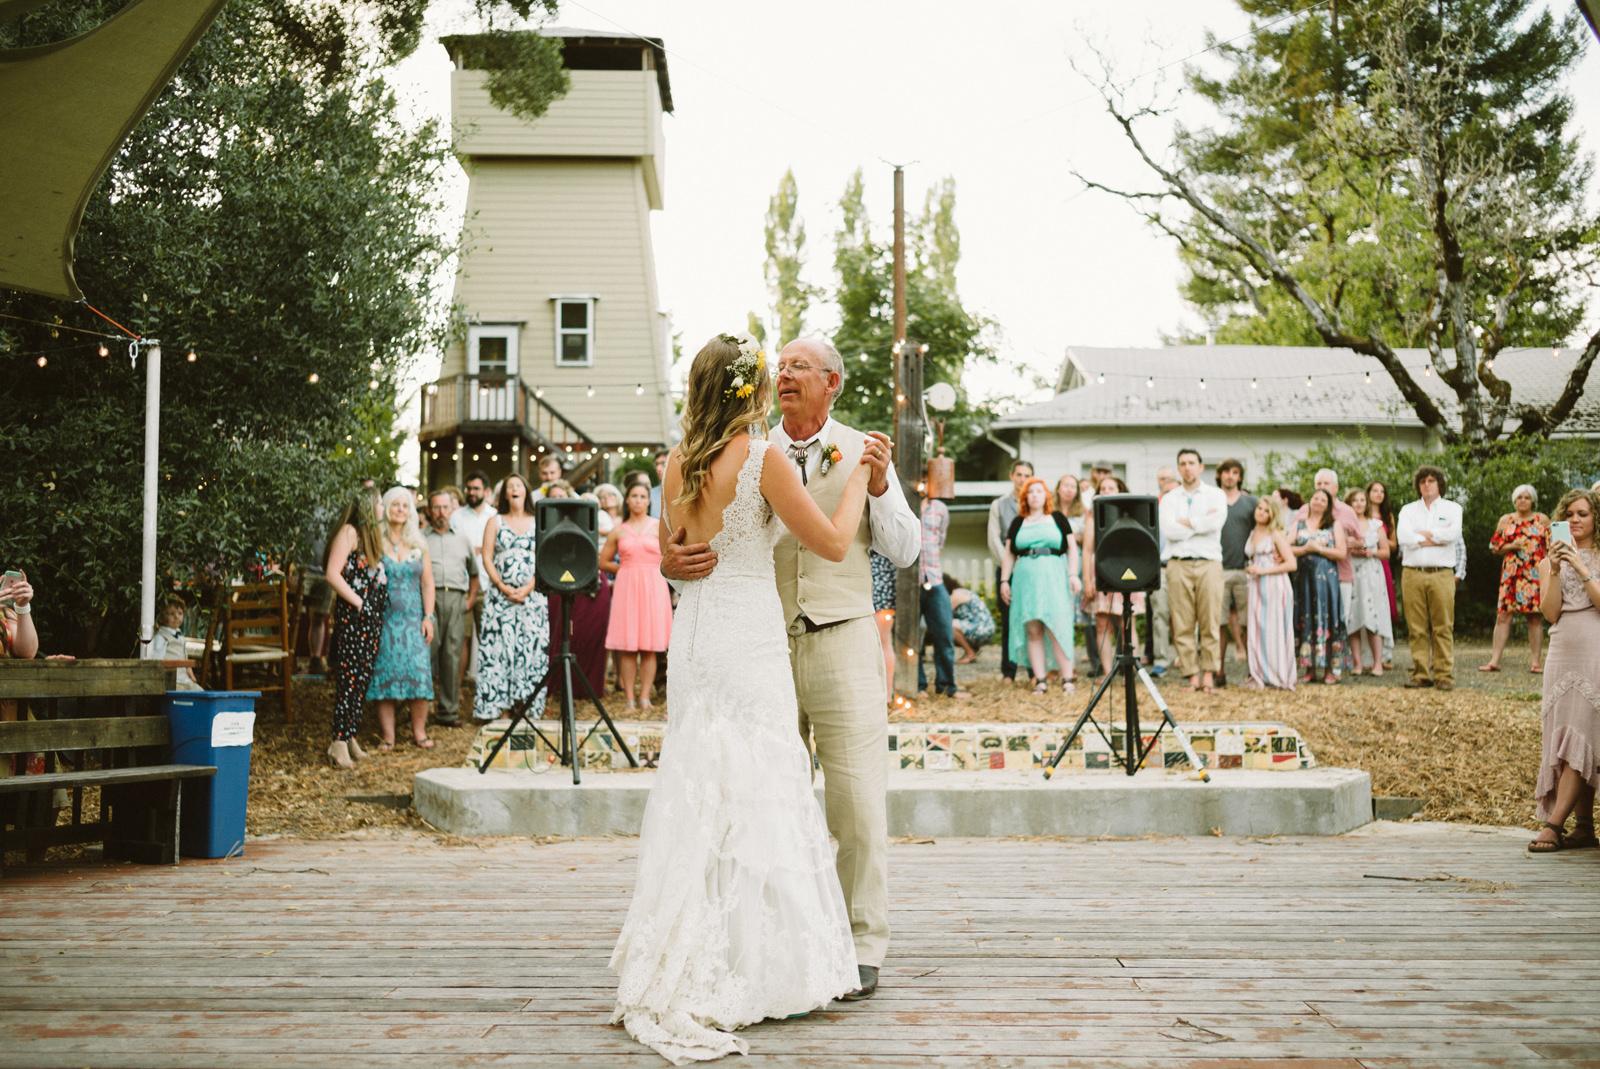 rivers-bend-retreat-wedding-093 RIVER'S BEND RETREAT WEDDING